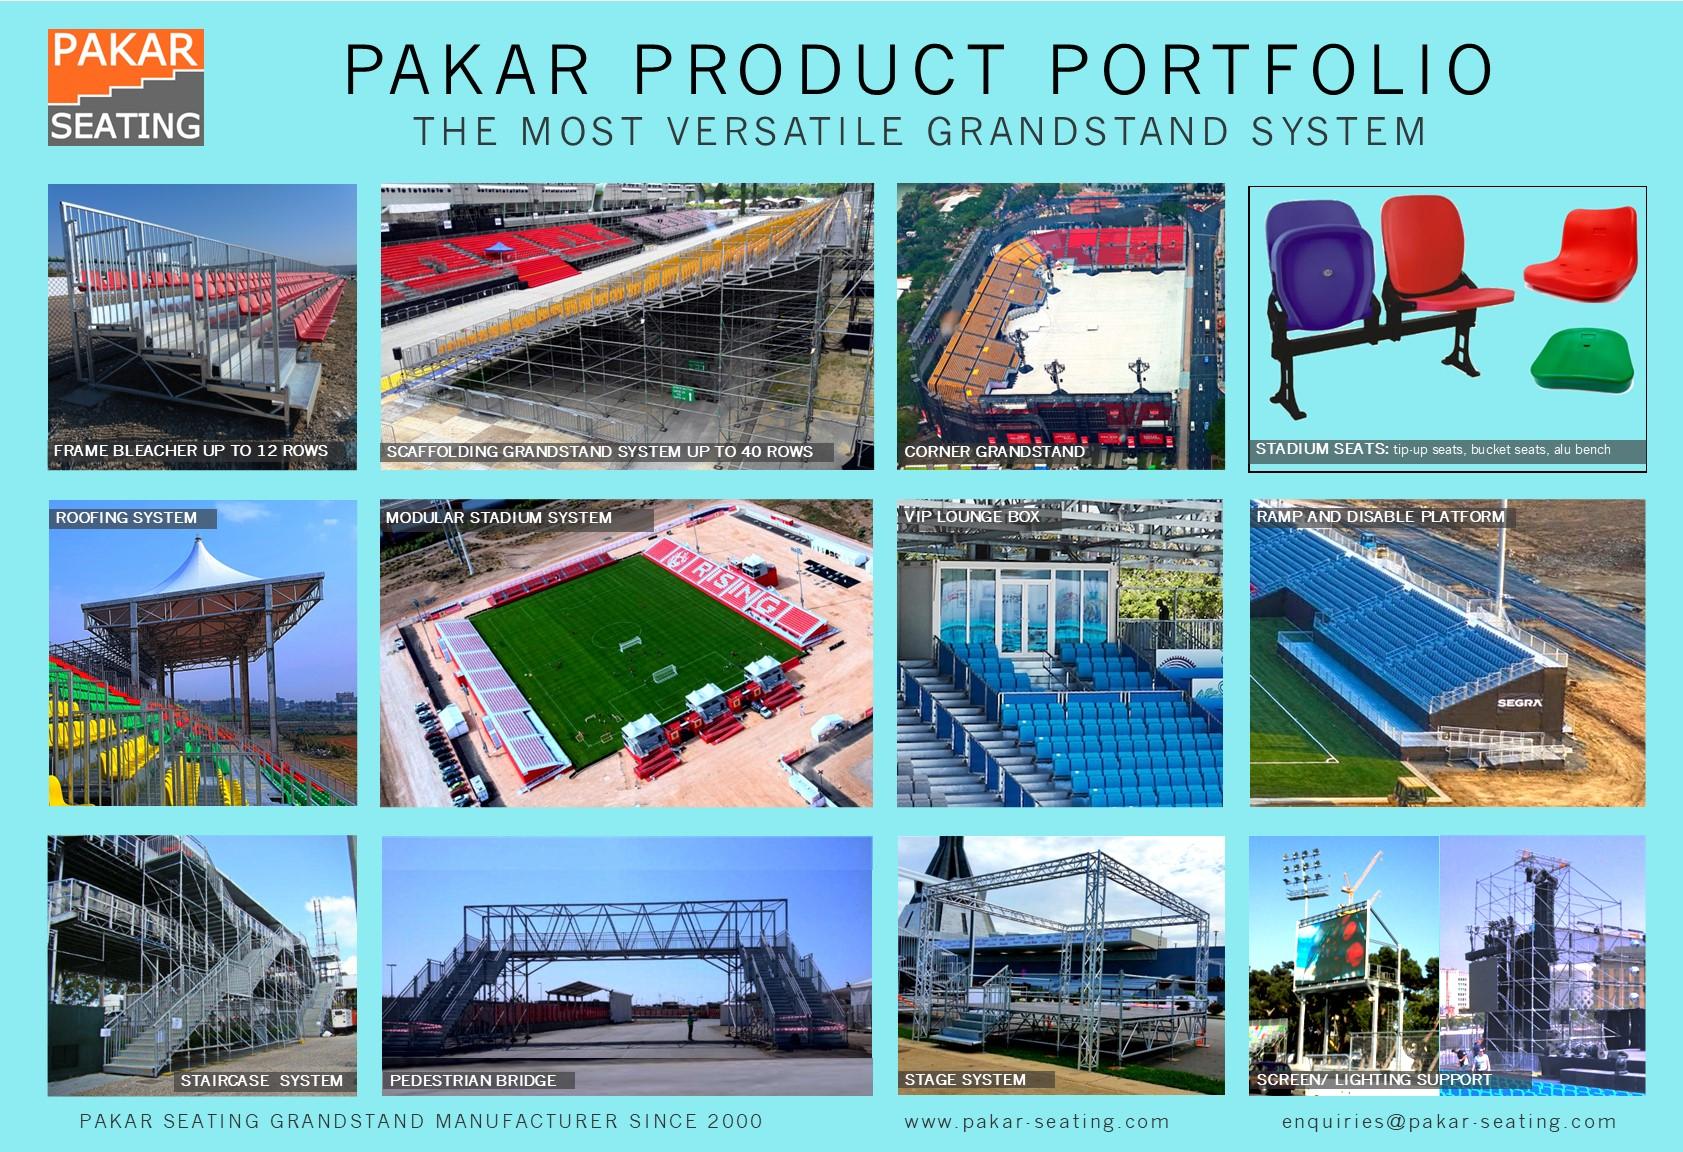 PAKAR PORTFOLIO 2020